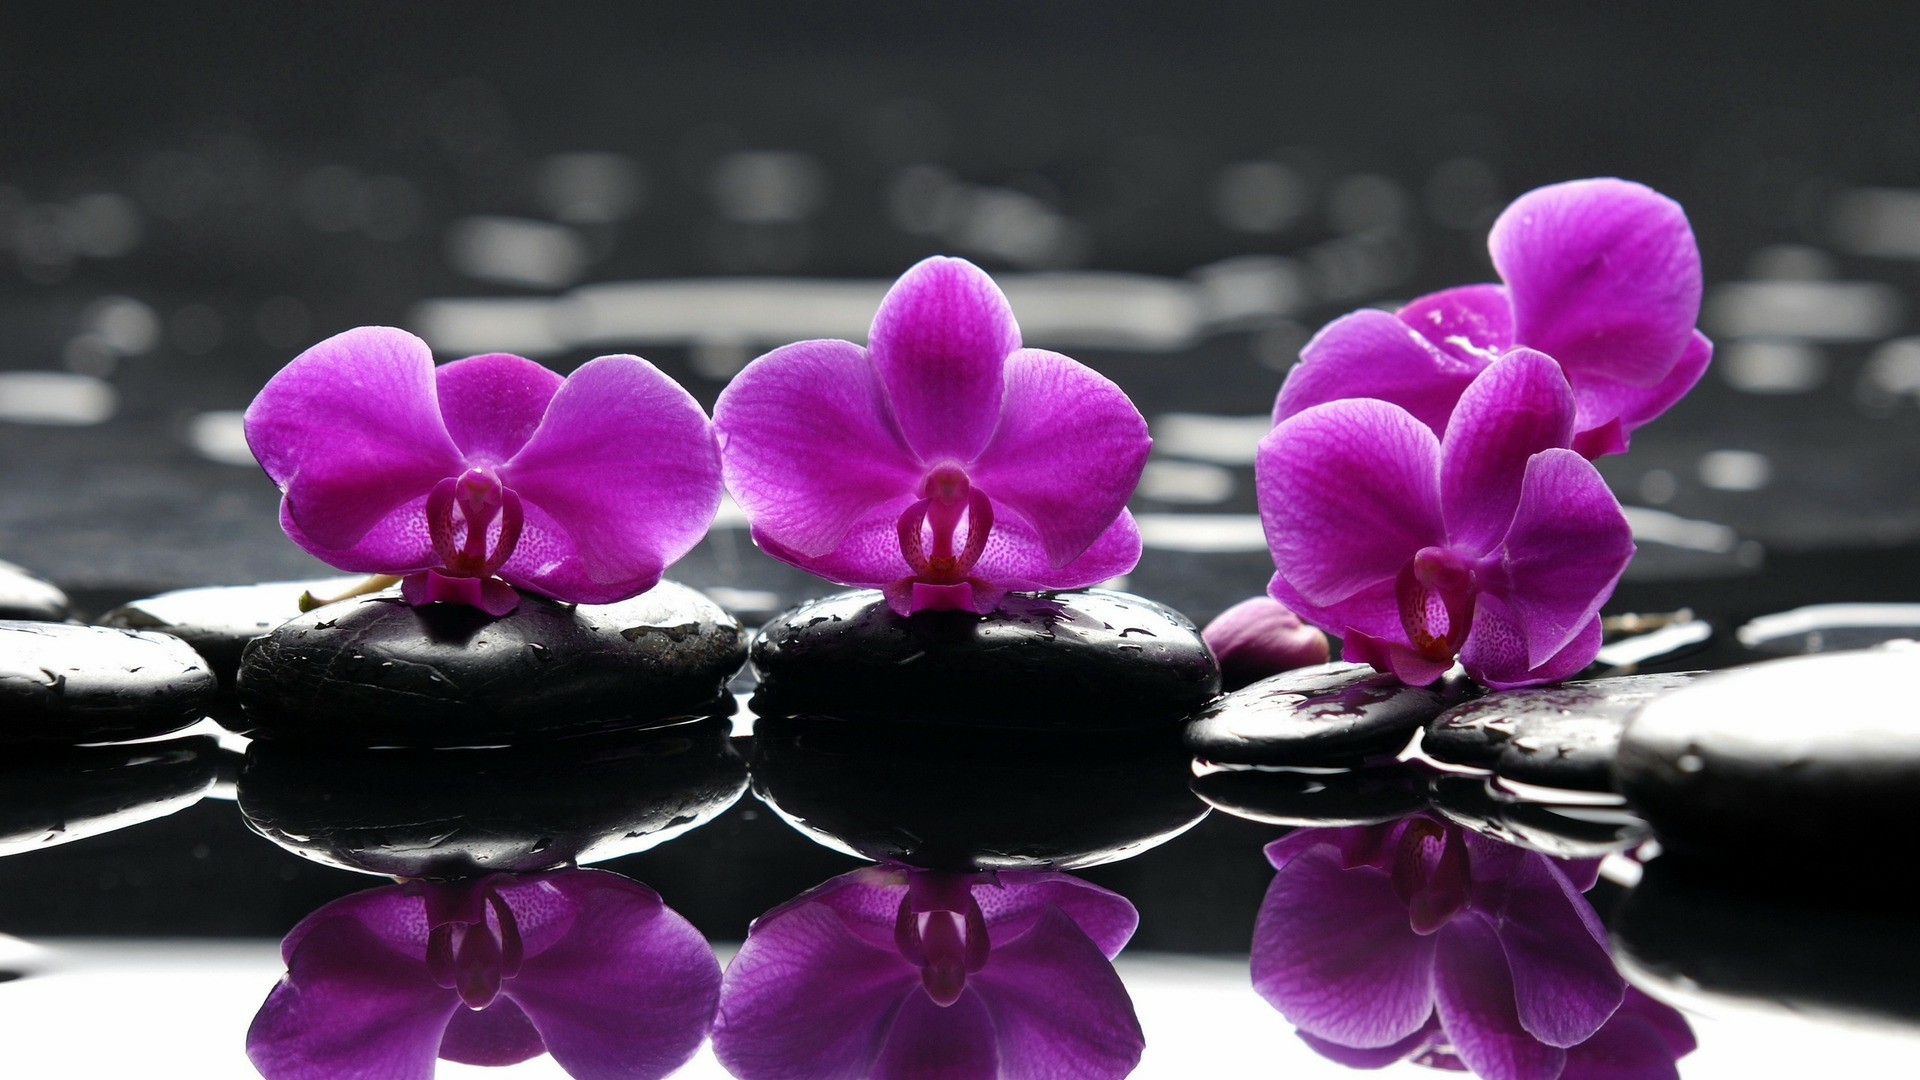 free-purple-orchids-flower-hd-wallpapers-download.jpg